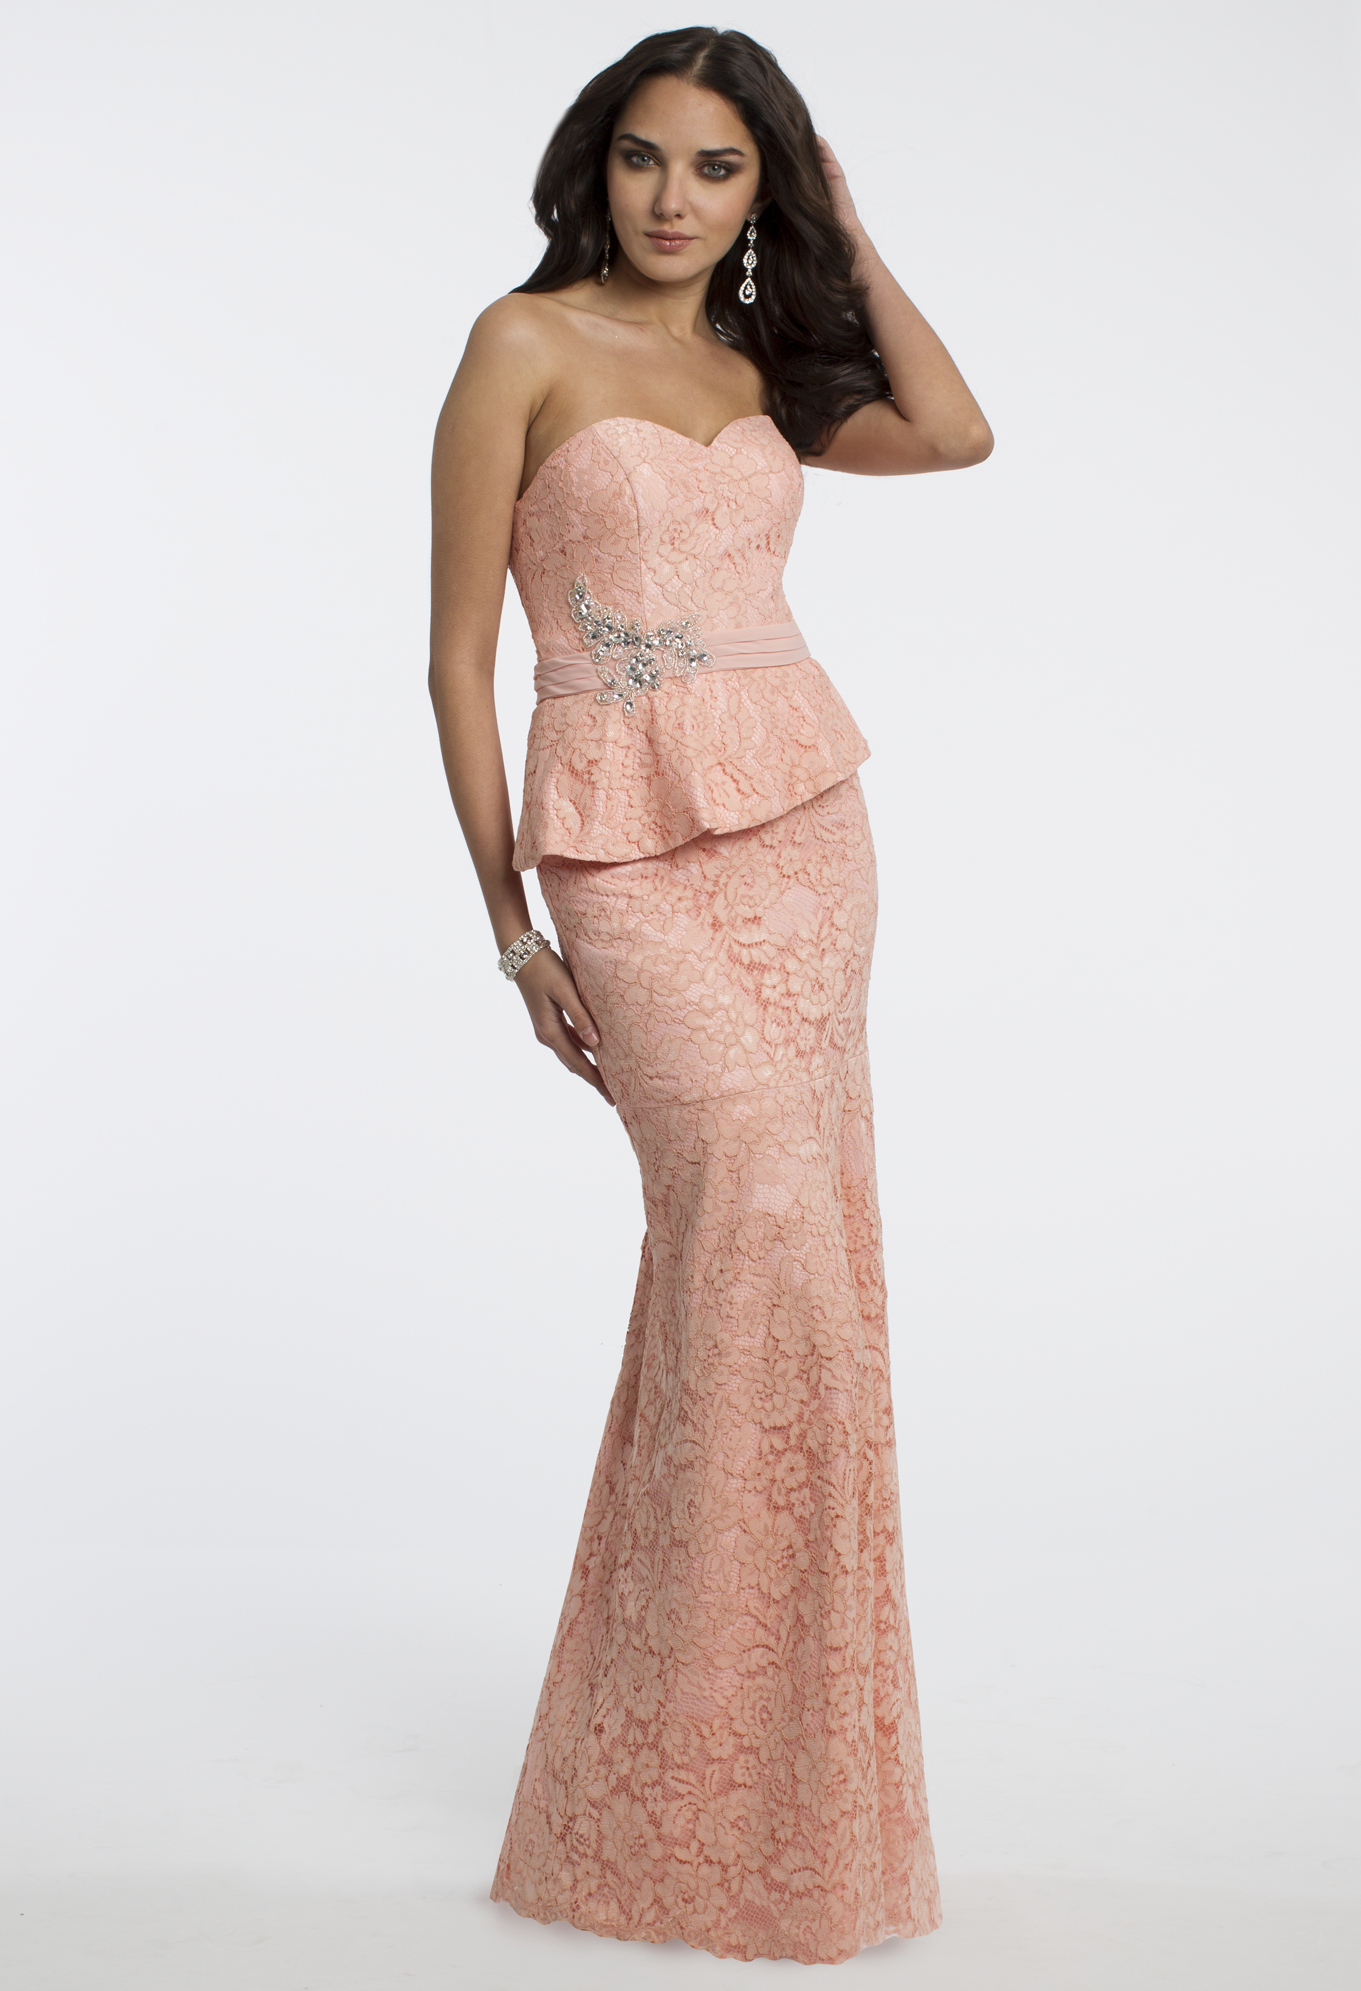 Camille la vie peplum prom dress with matching shawl prom camille la vie peplum prom dress with matching shawl ombrellifo Images